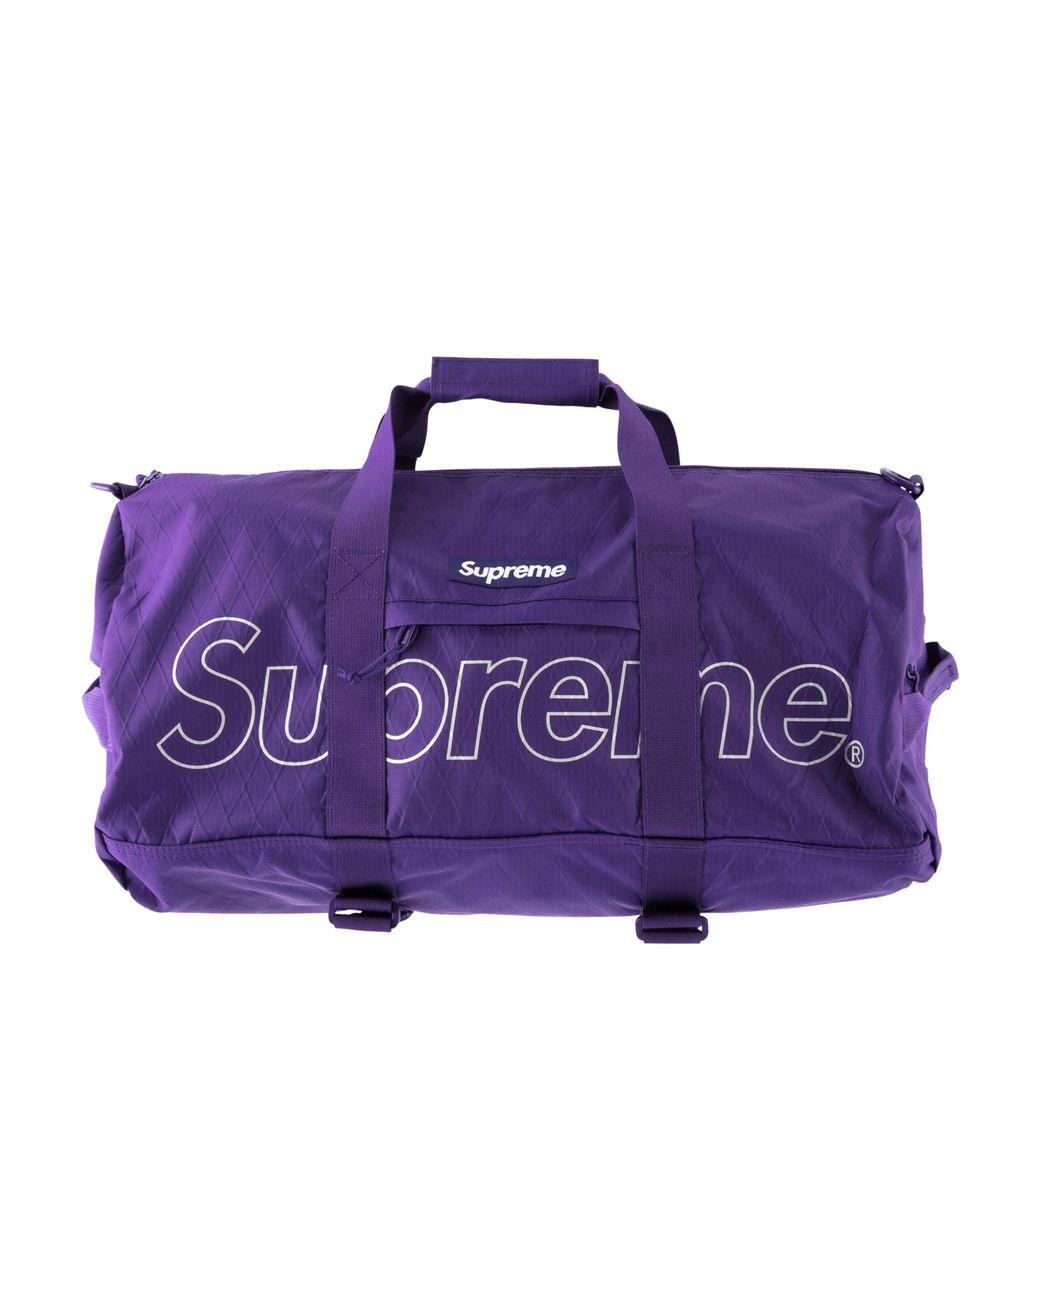 6b8a088c406f Supreme Duffel Bag in Purple for Men - Lyst